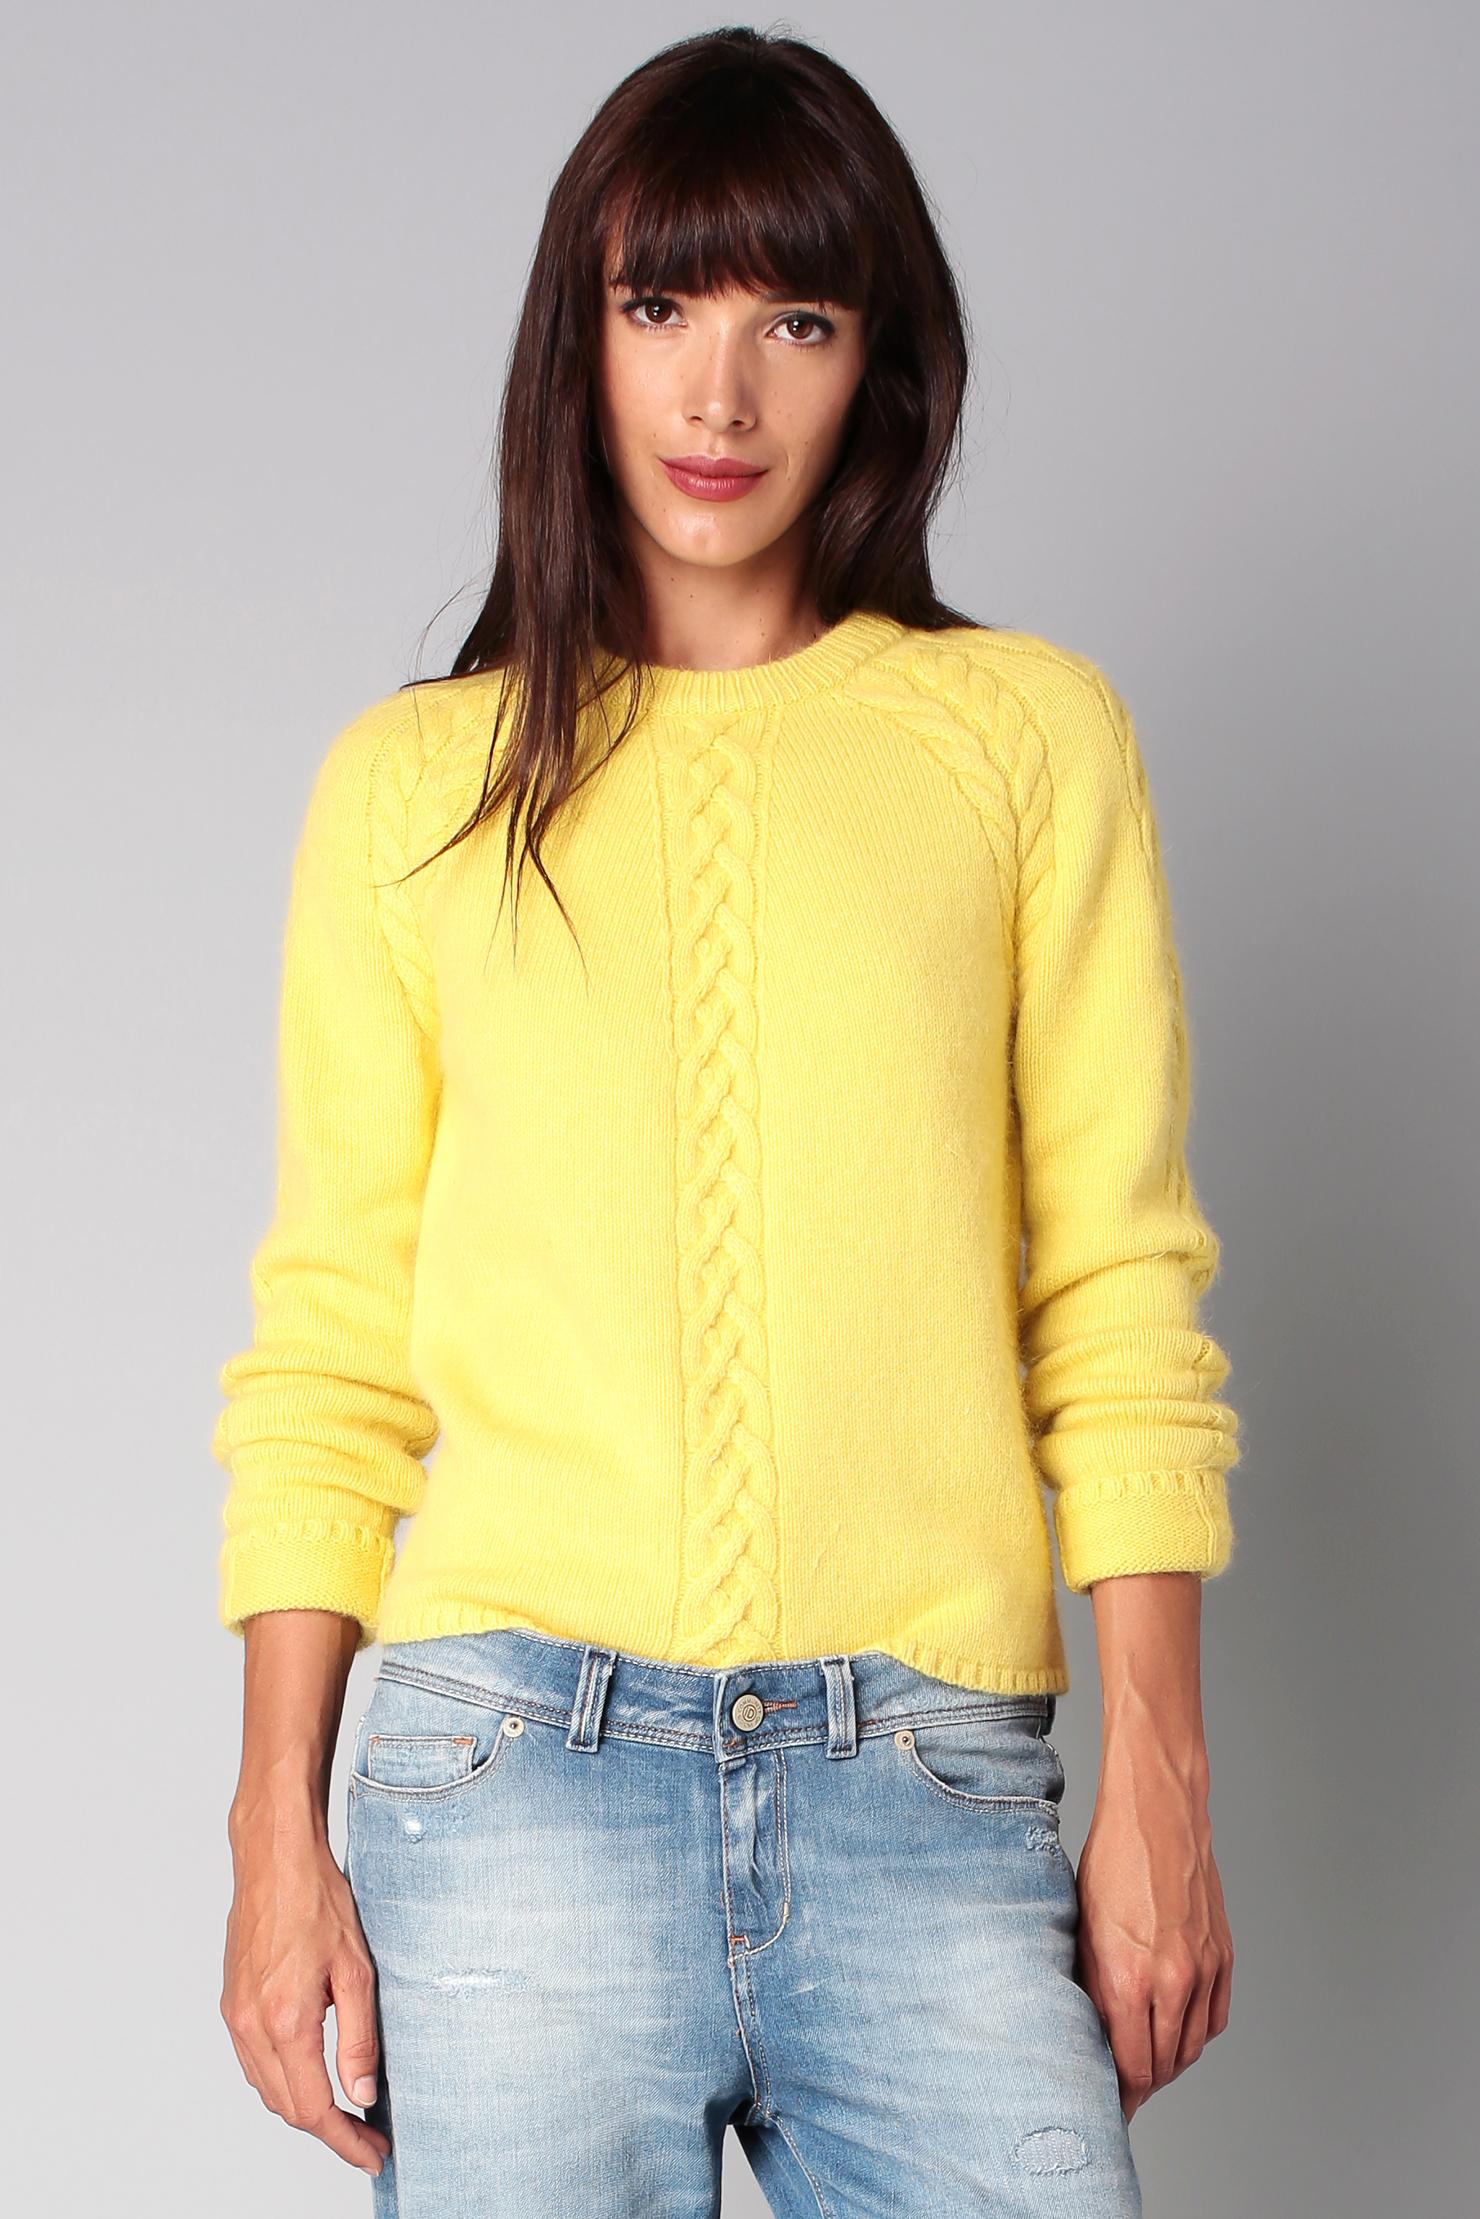 paul joe sister jumper in yellow lyst. Black Bedroom Furniture Sets. Home Design Ideas